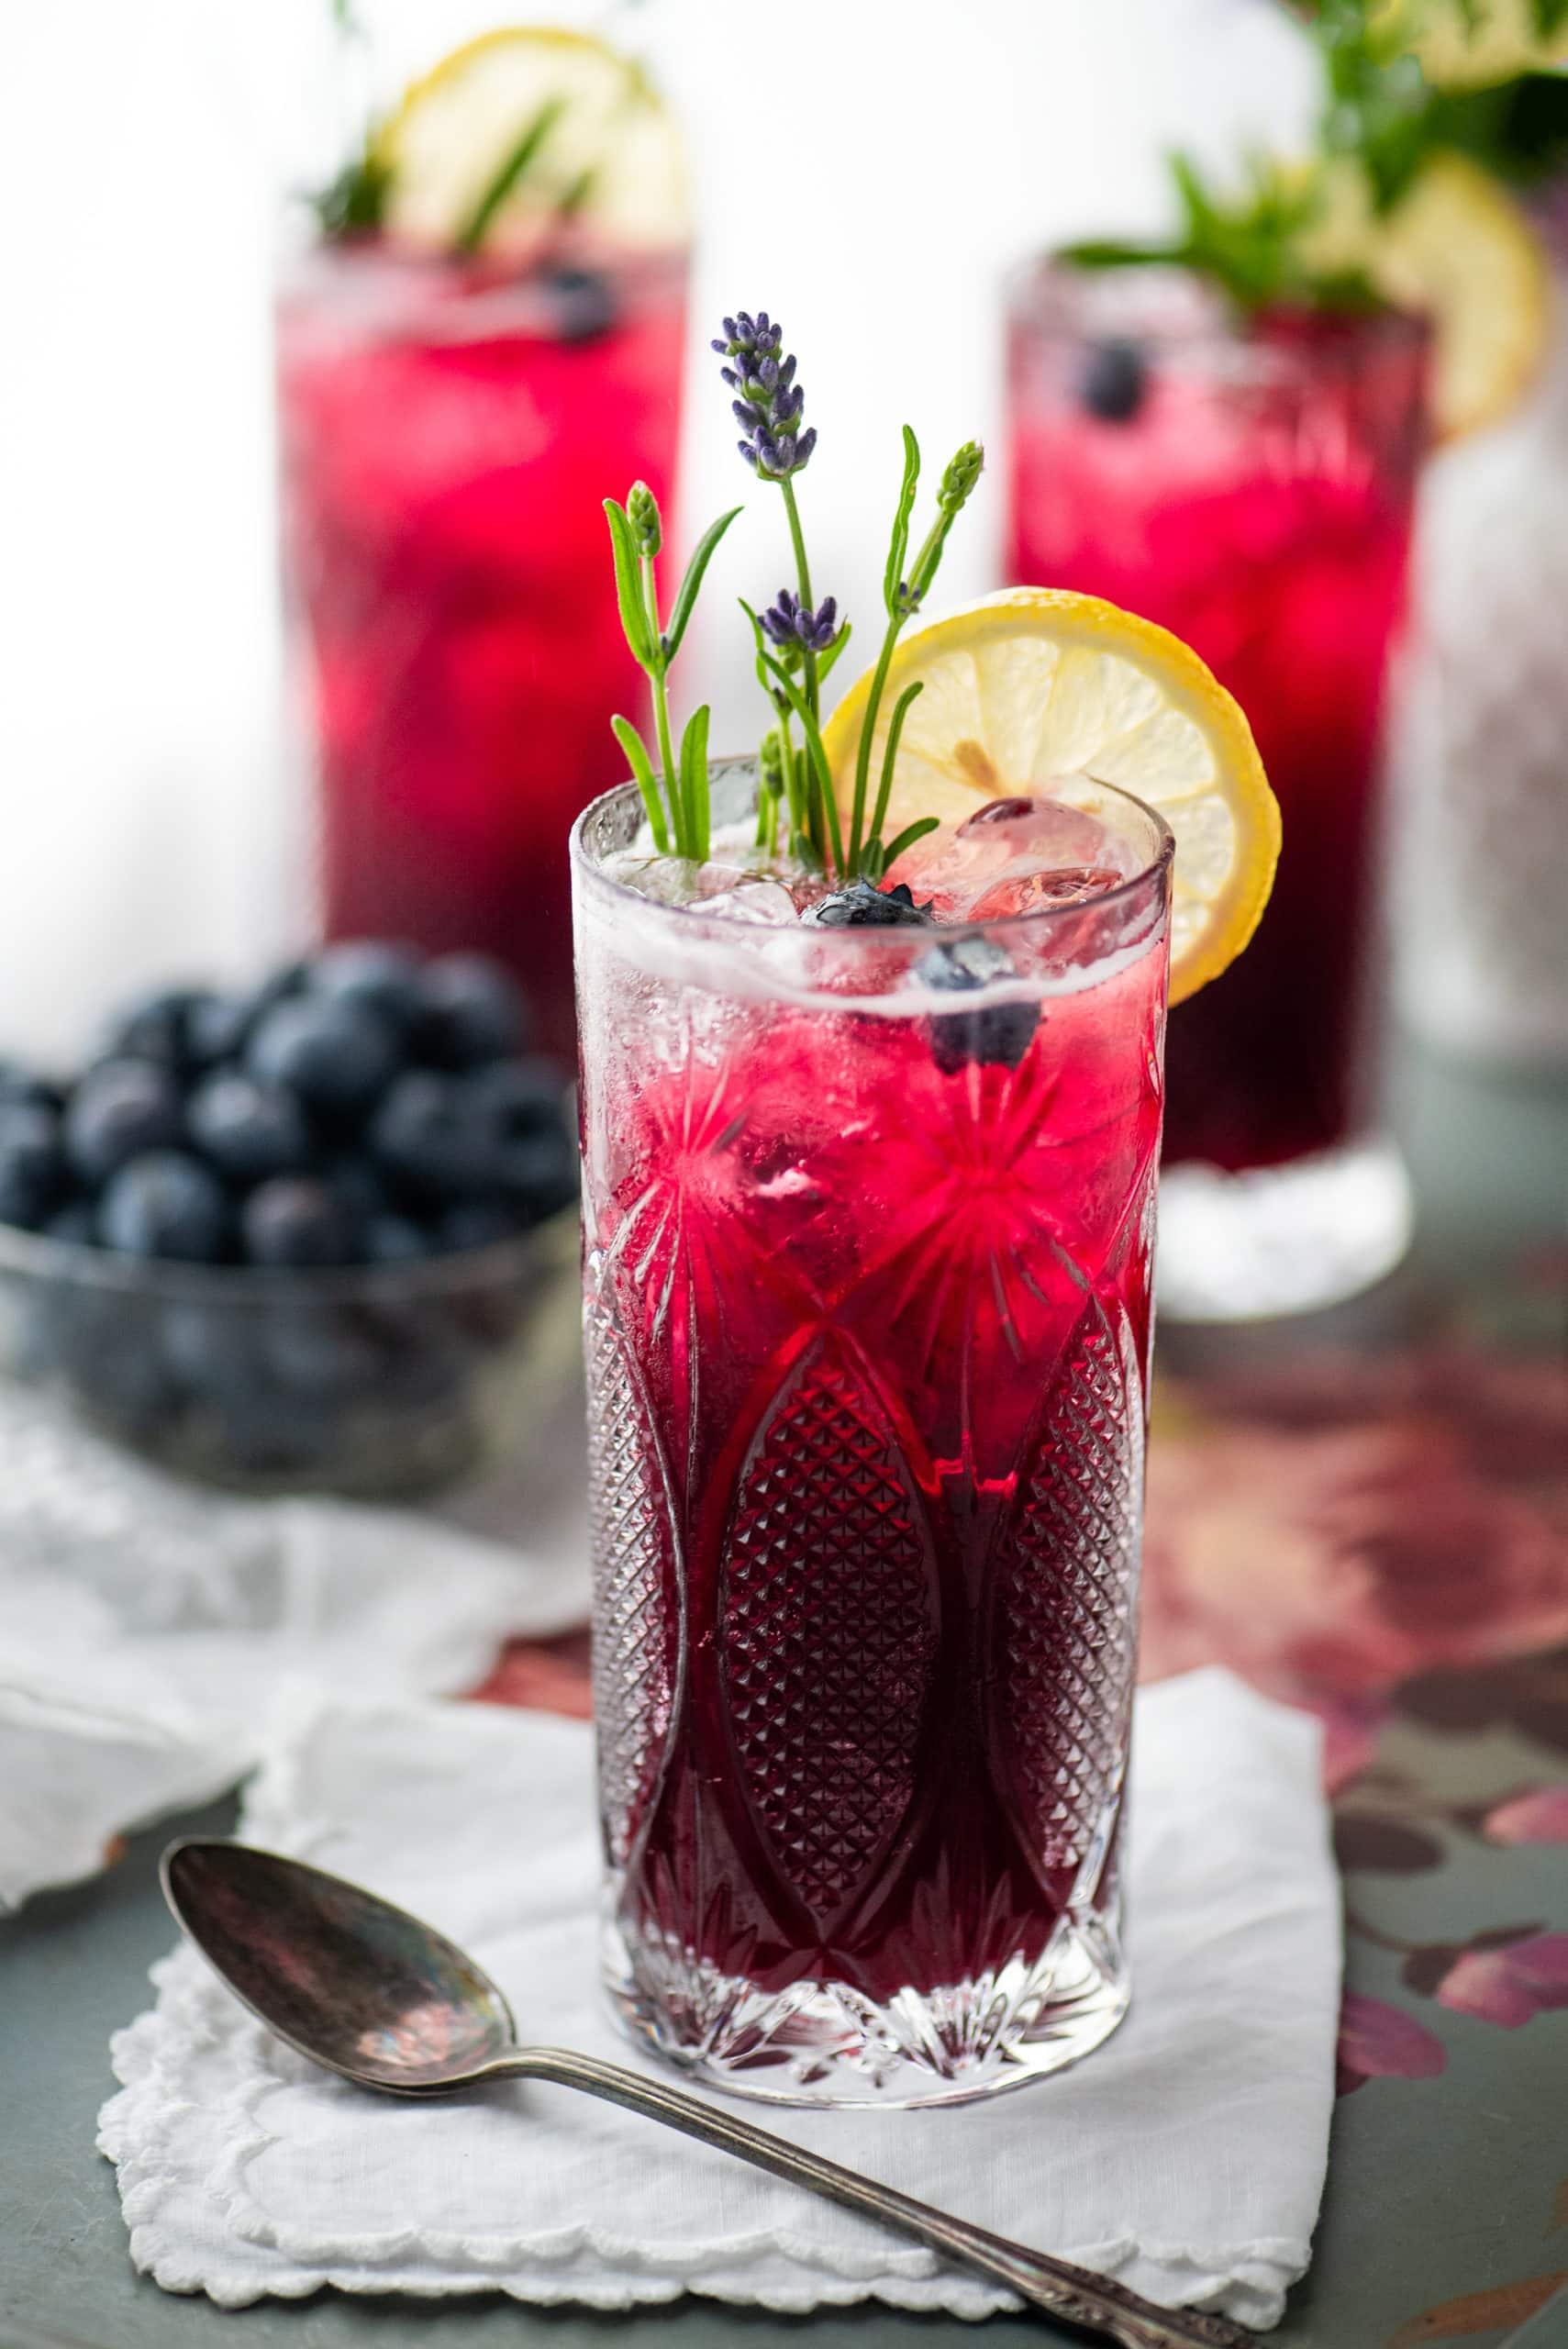 Blueberry Lavender Soda 6911 scaled - Blueberry Lavender Soda